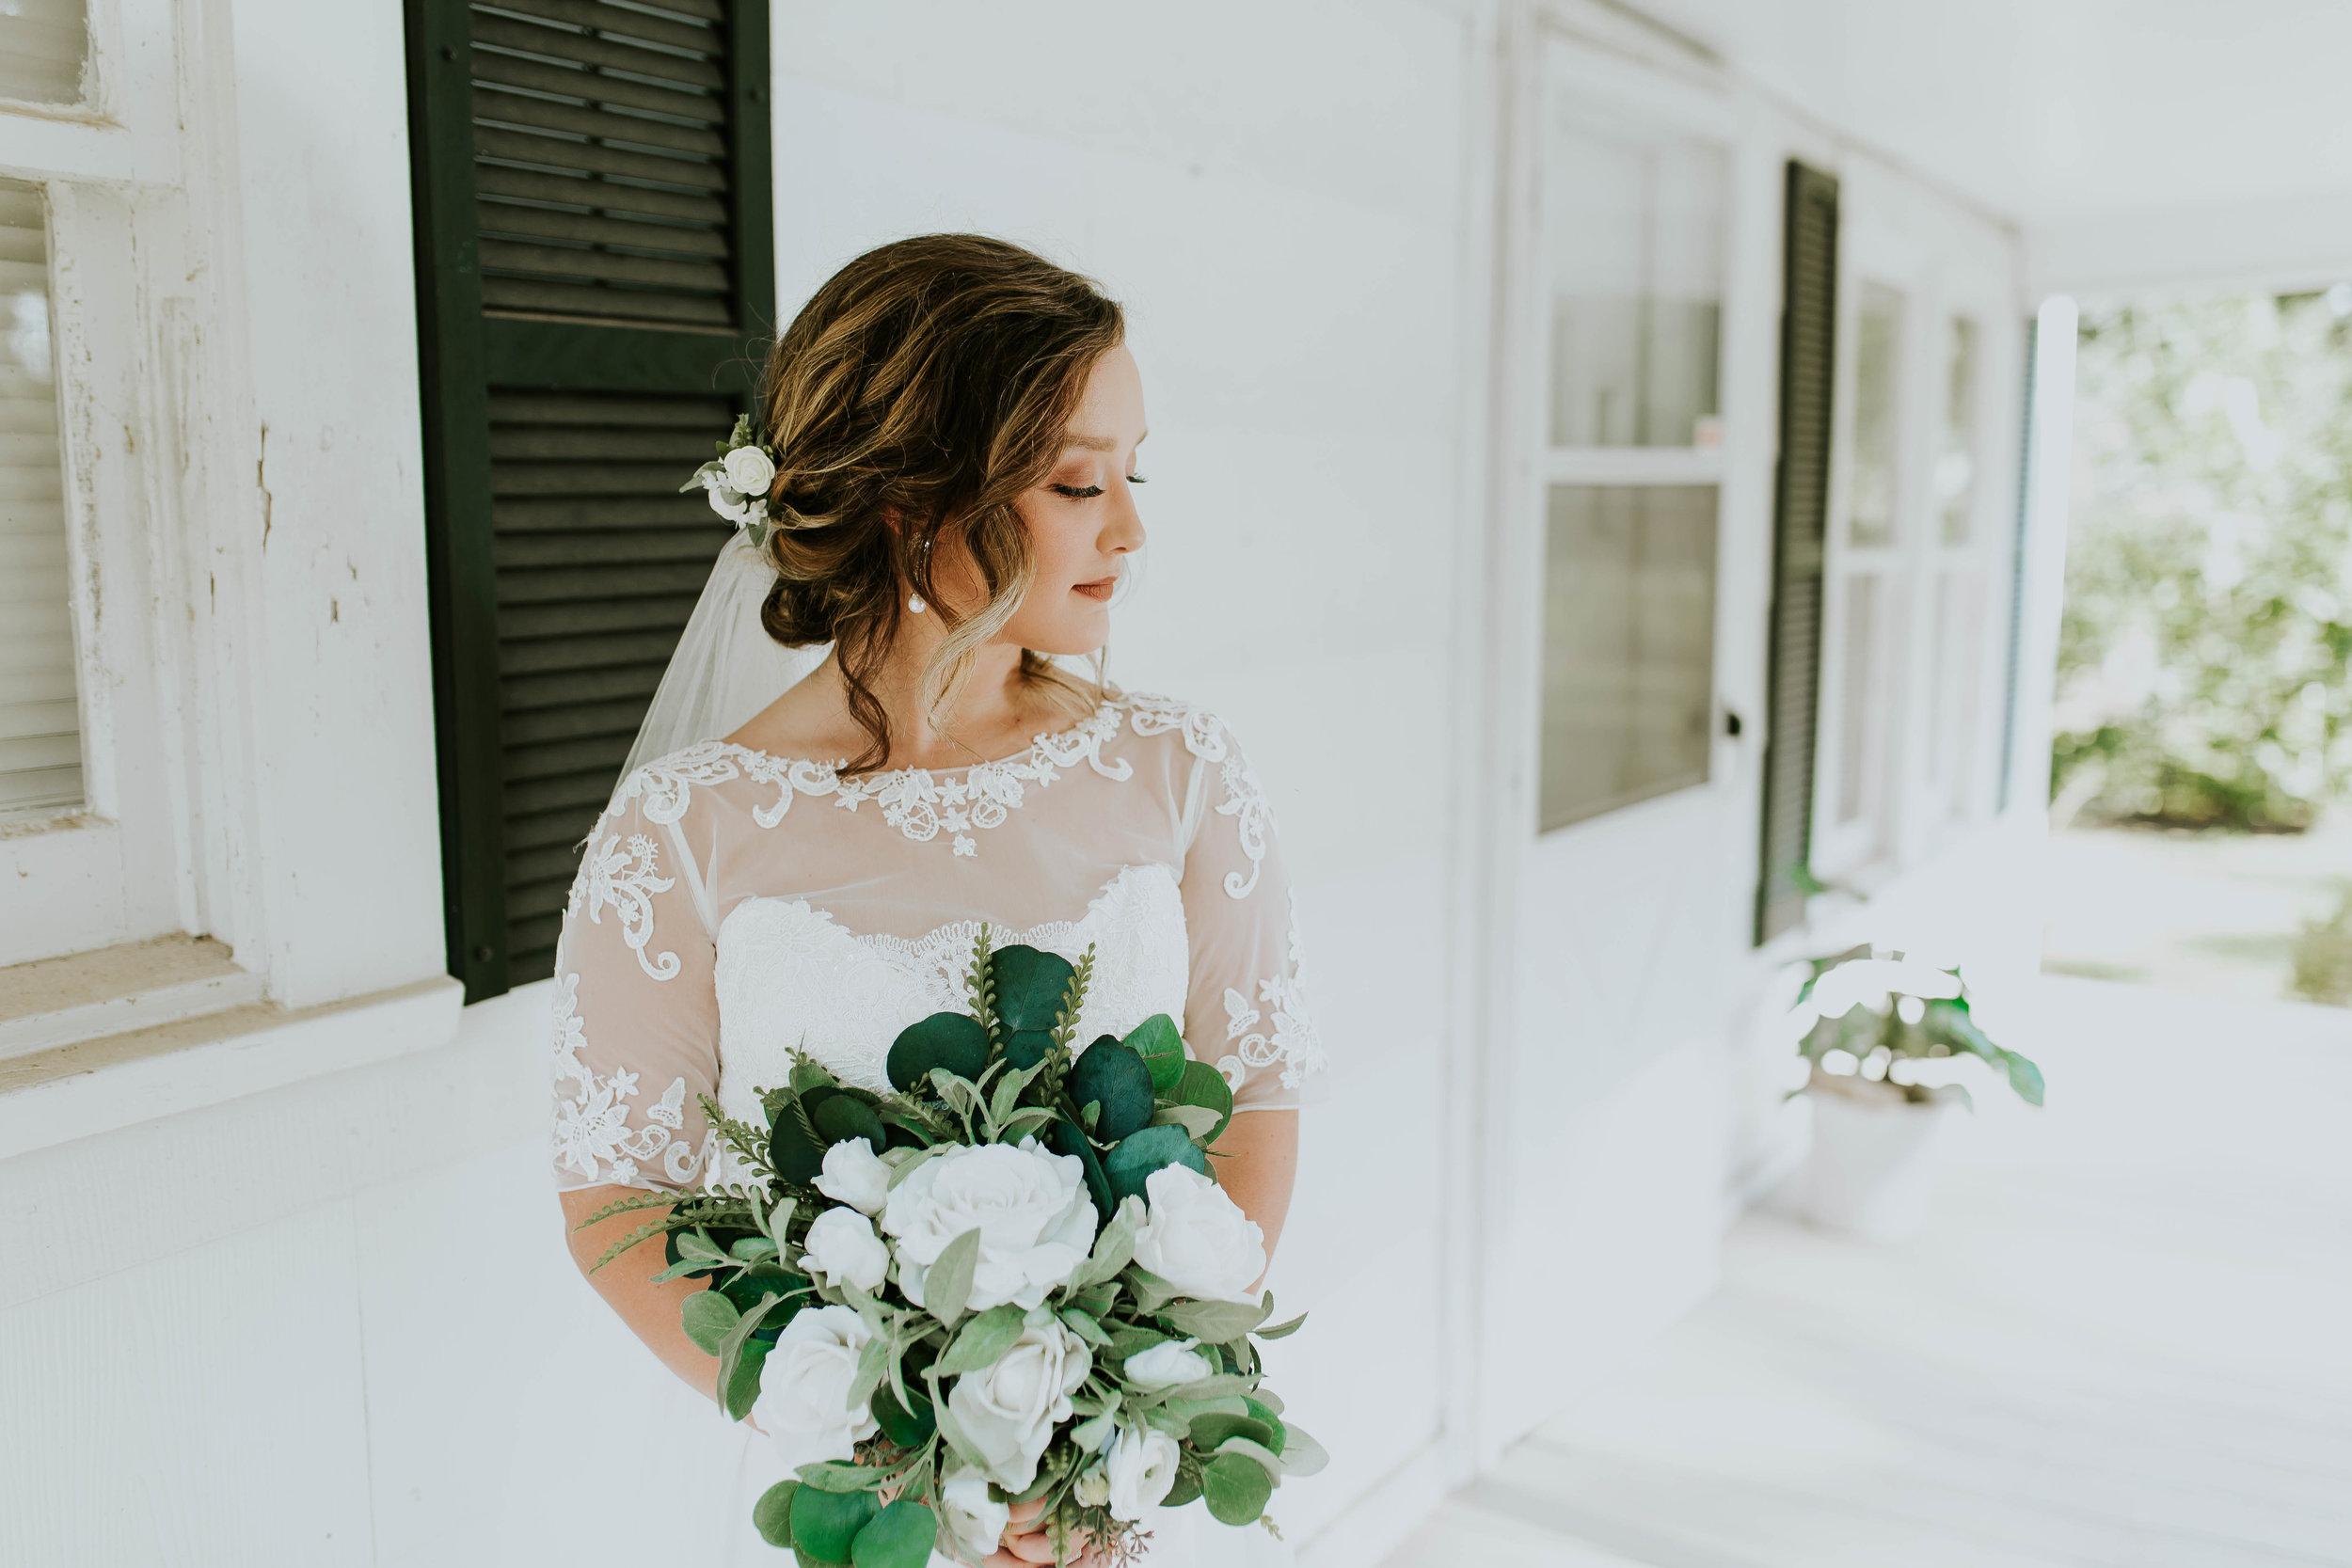 Wedding Dresses in Baton Rouge Photography